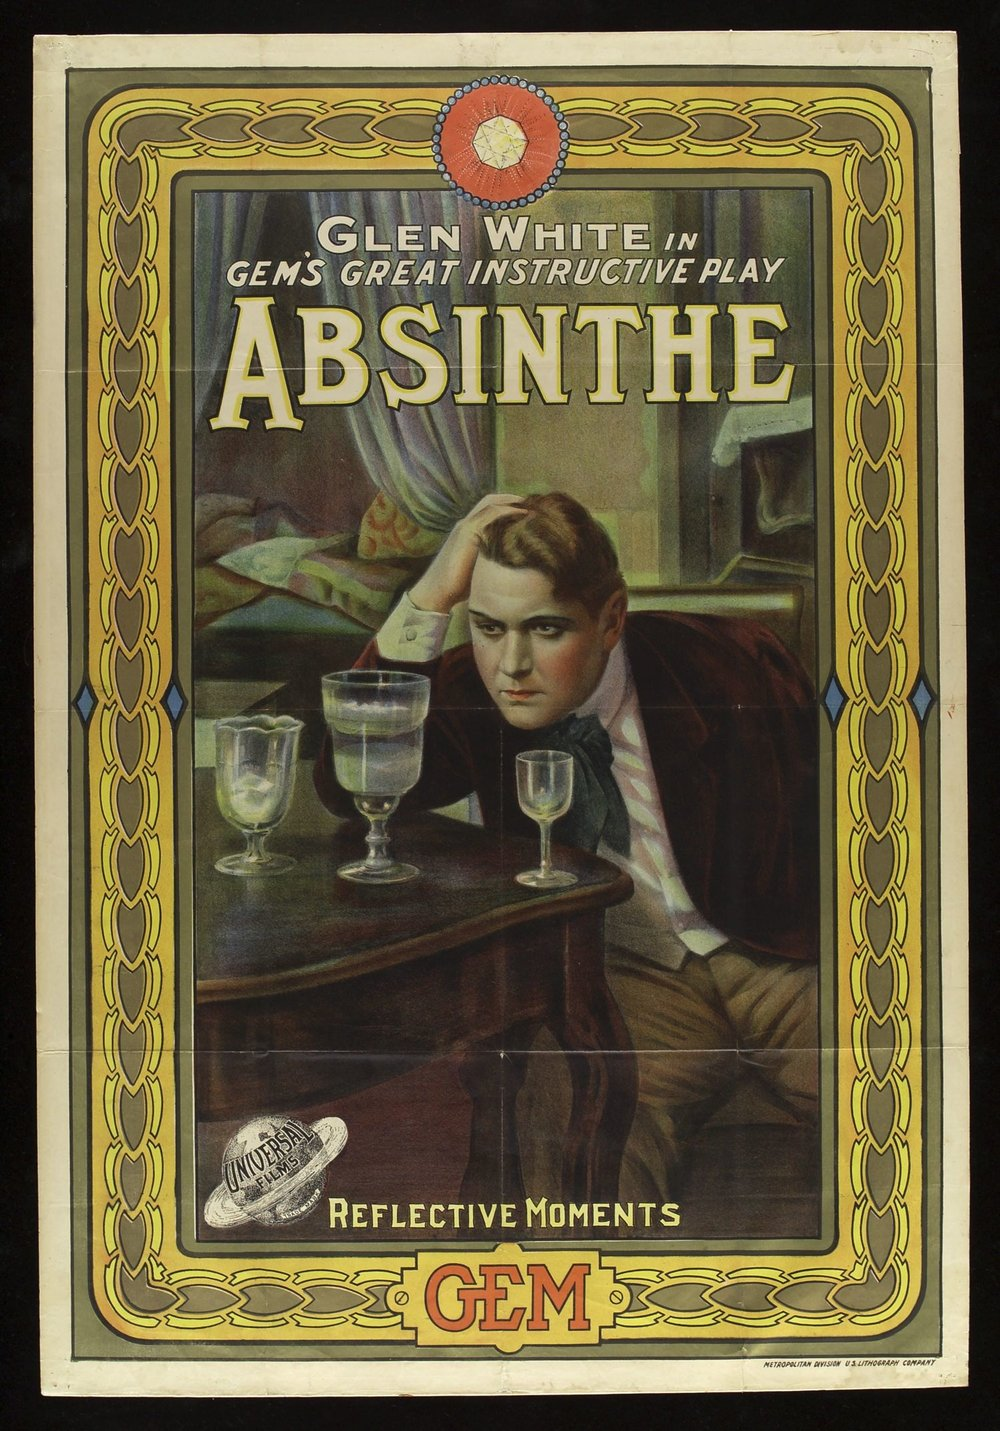 Absinthe4-min.jpg